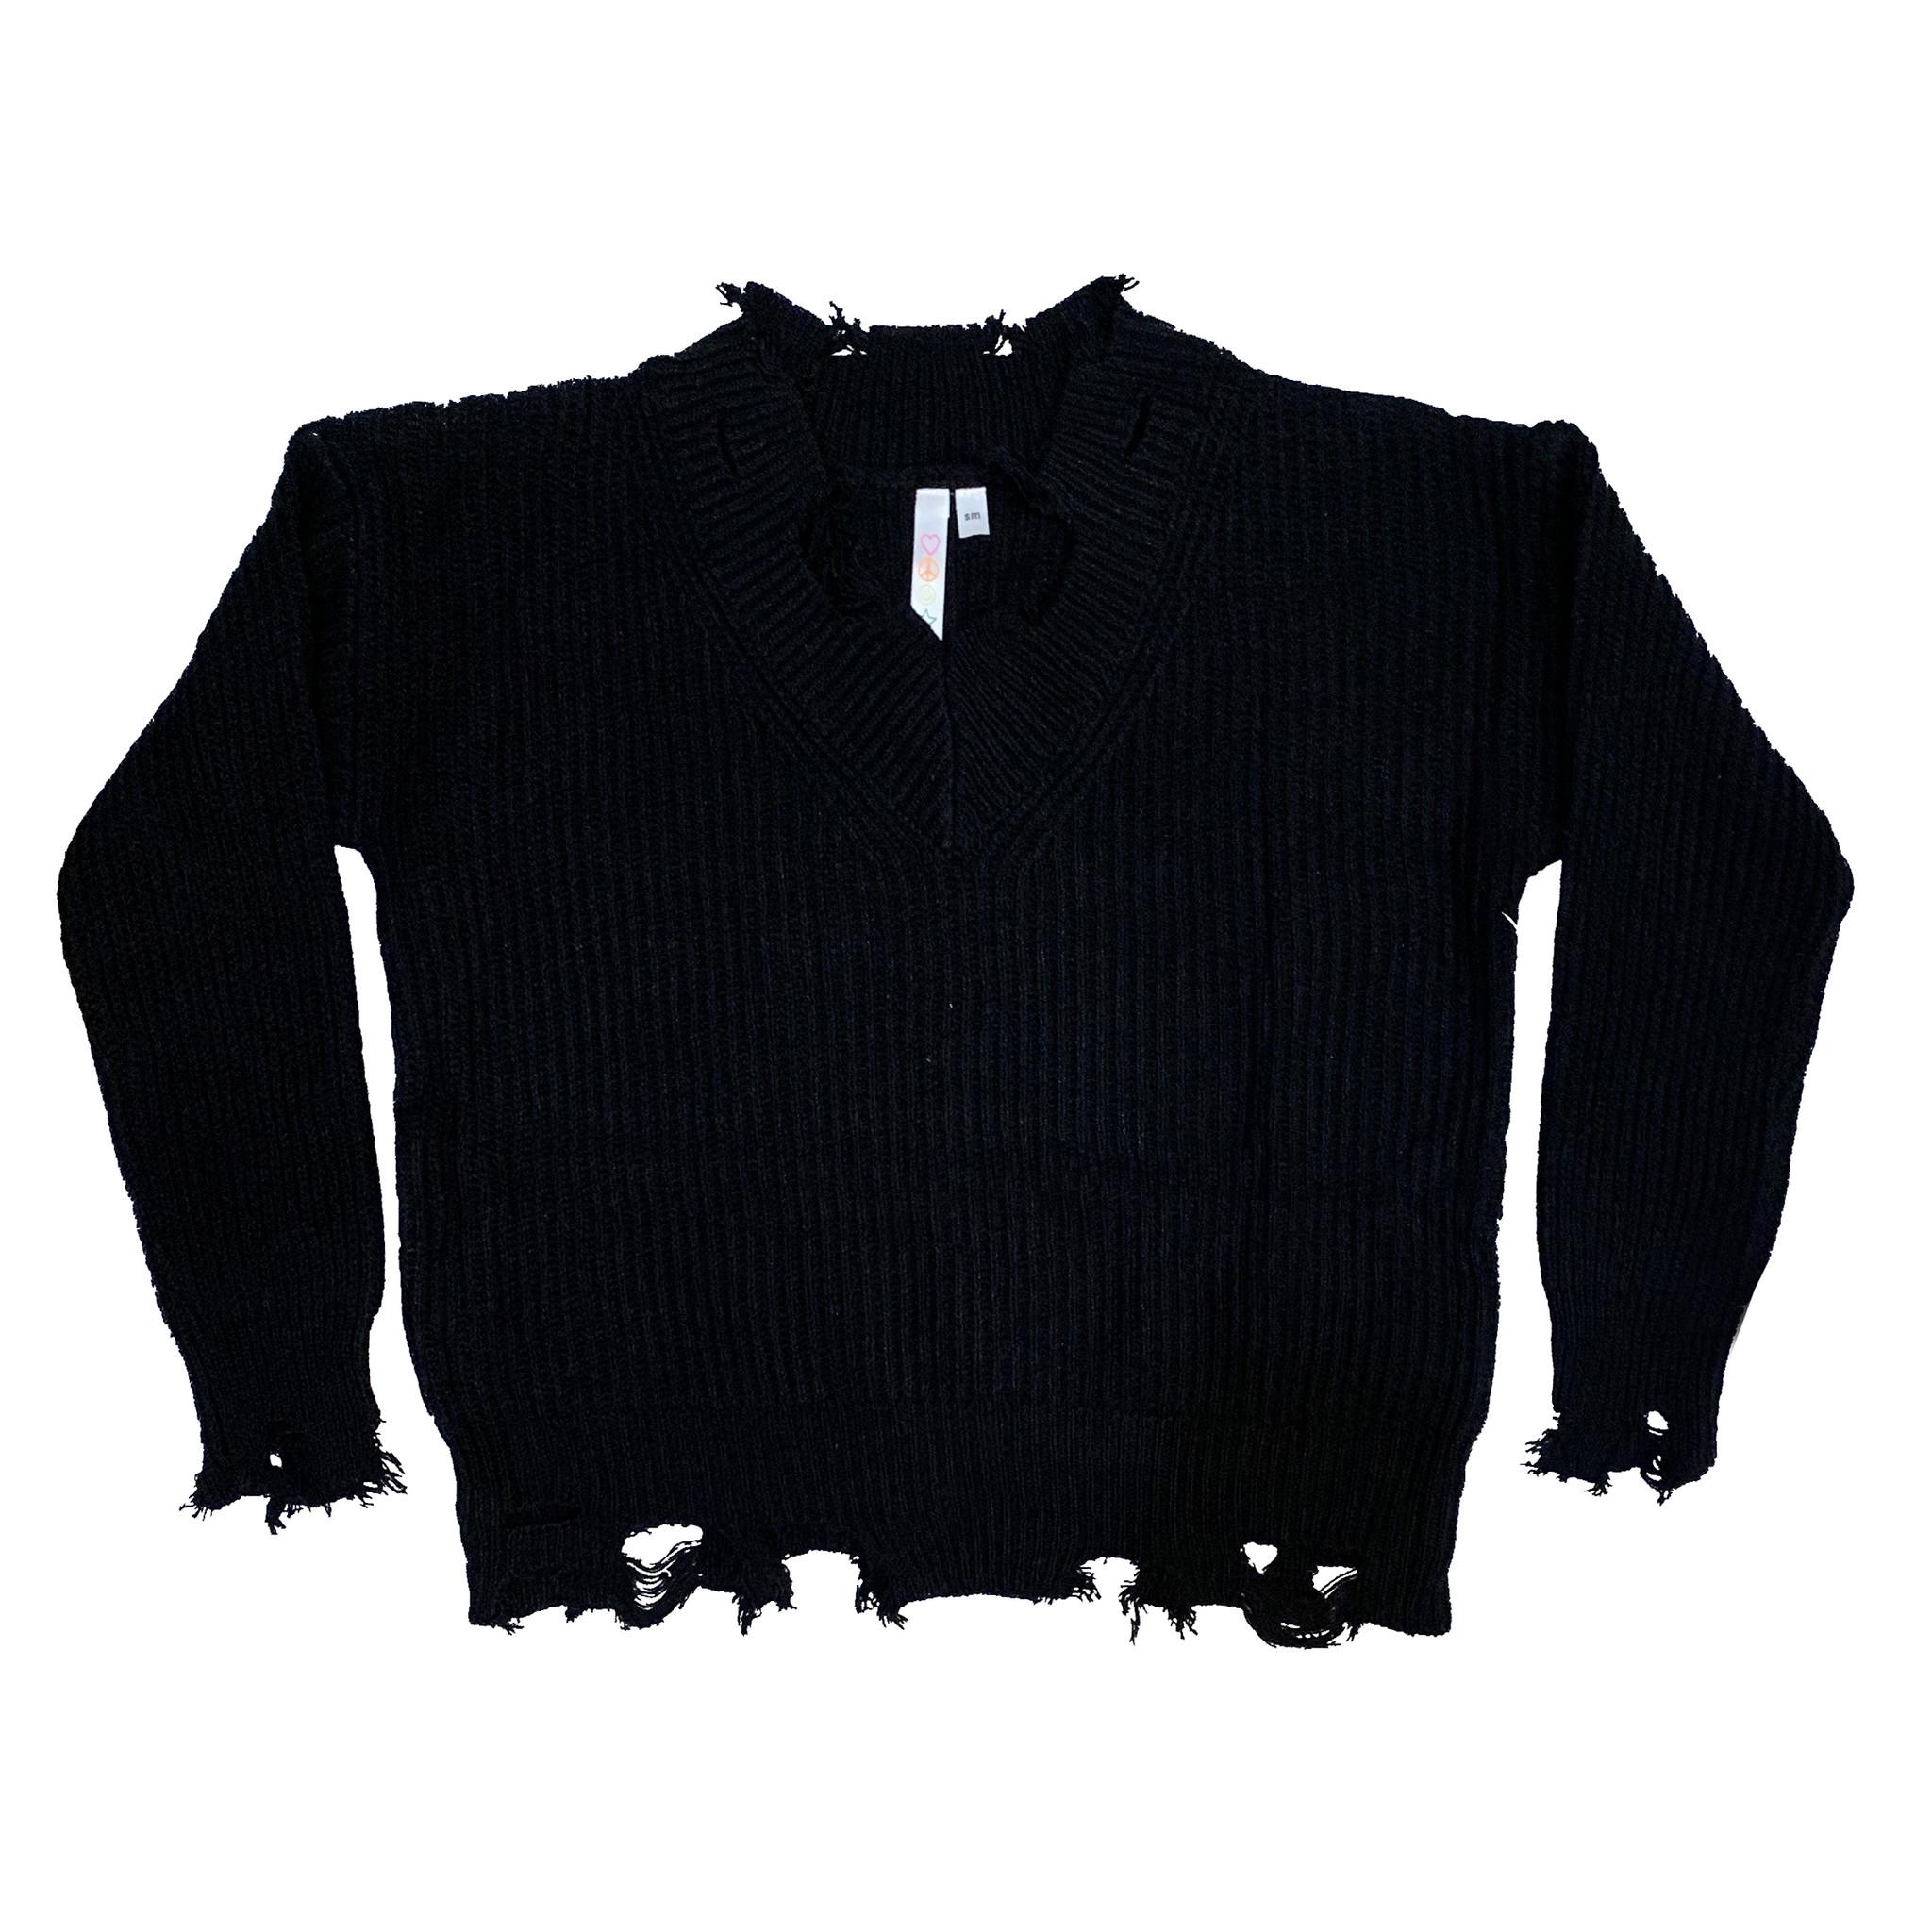 Malibu Sugar Distressed Black Sweater